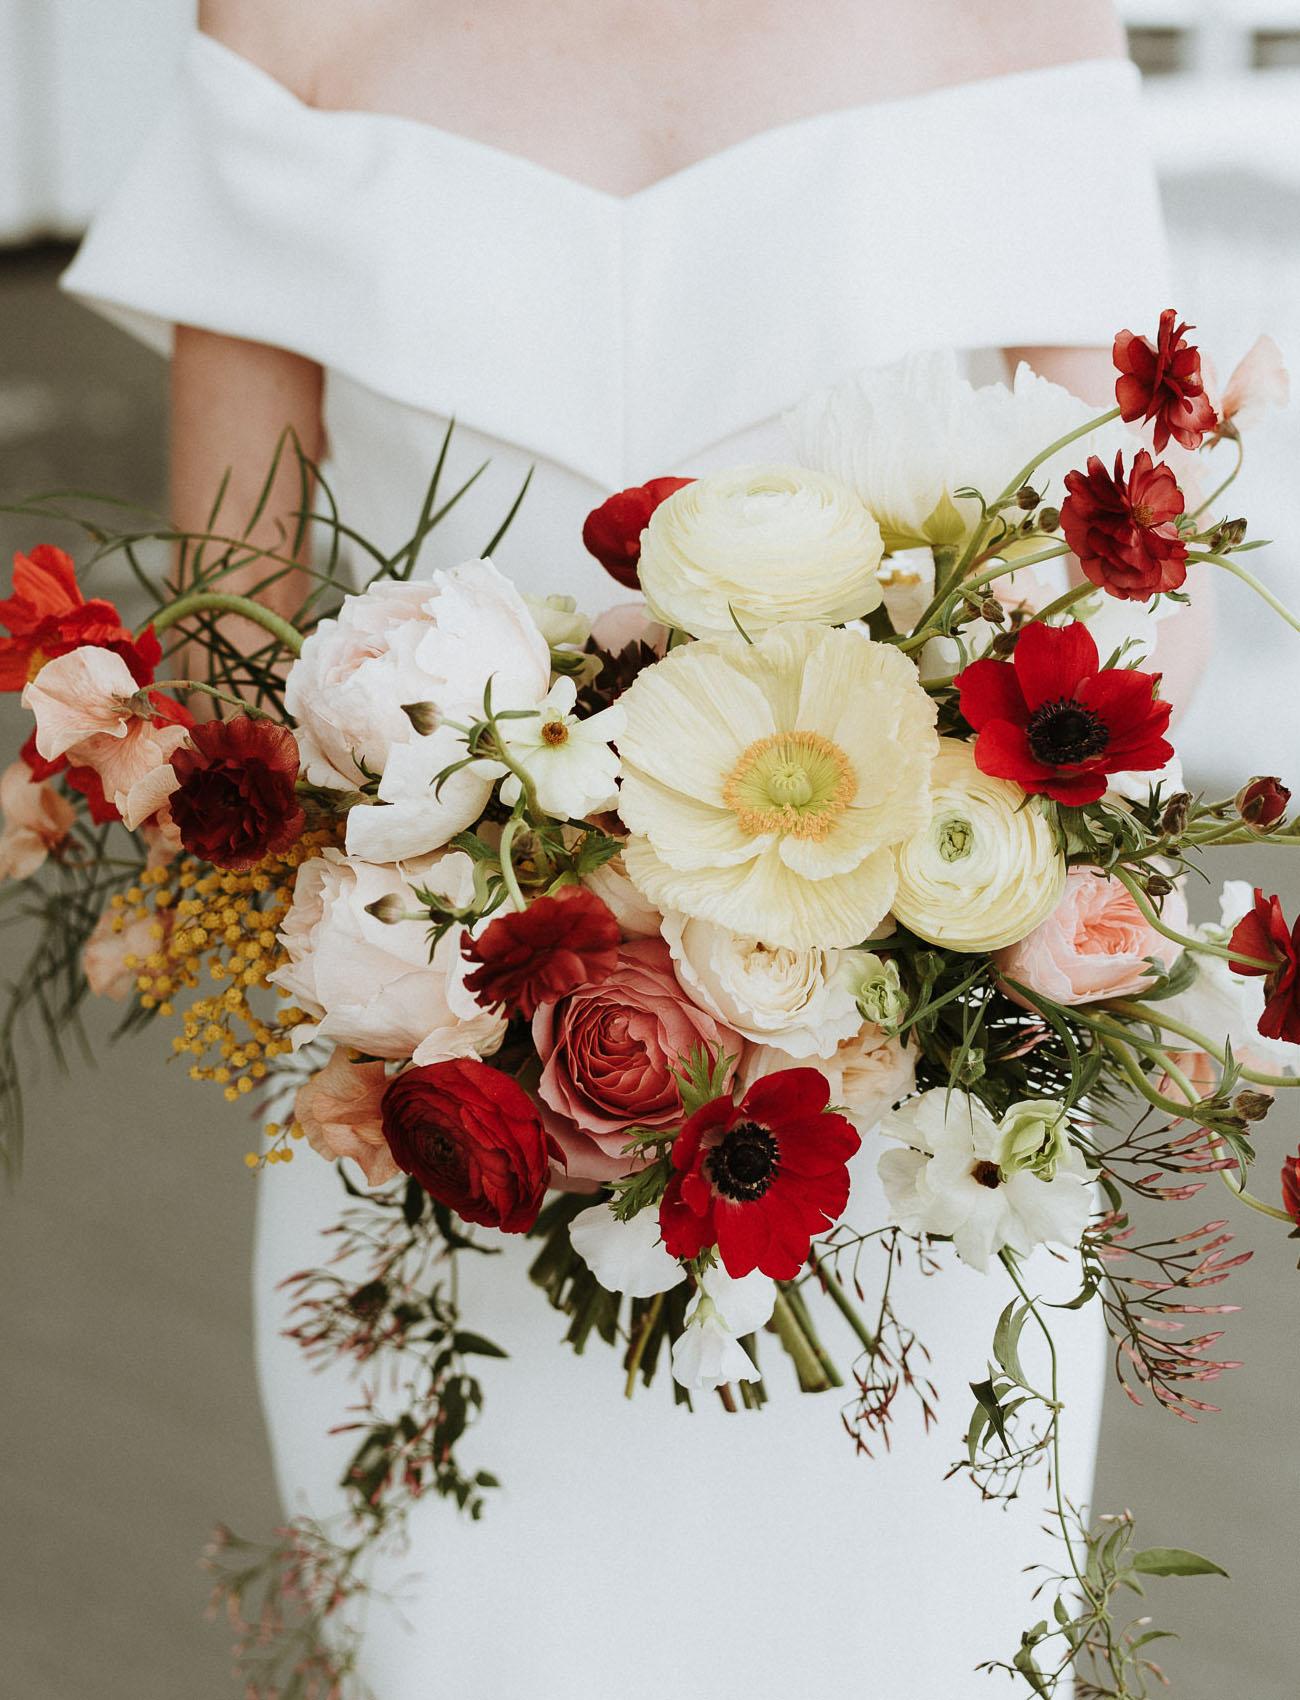 red winter poppy bouquet